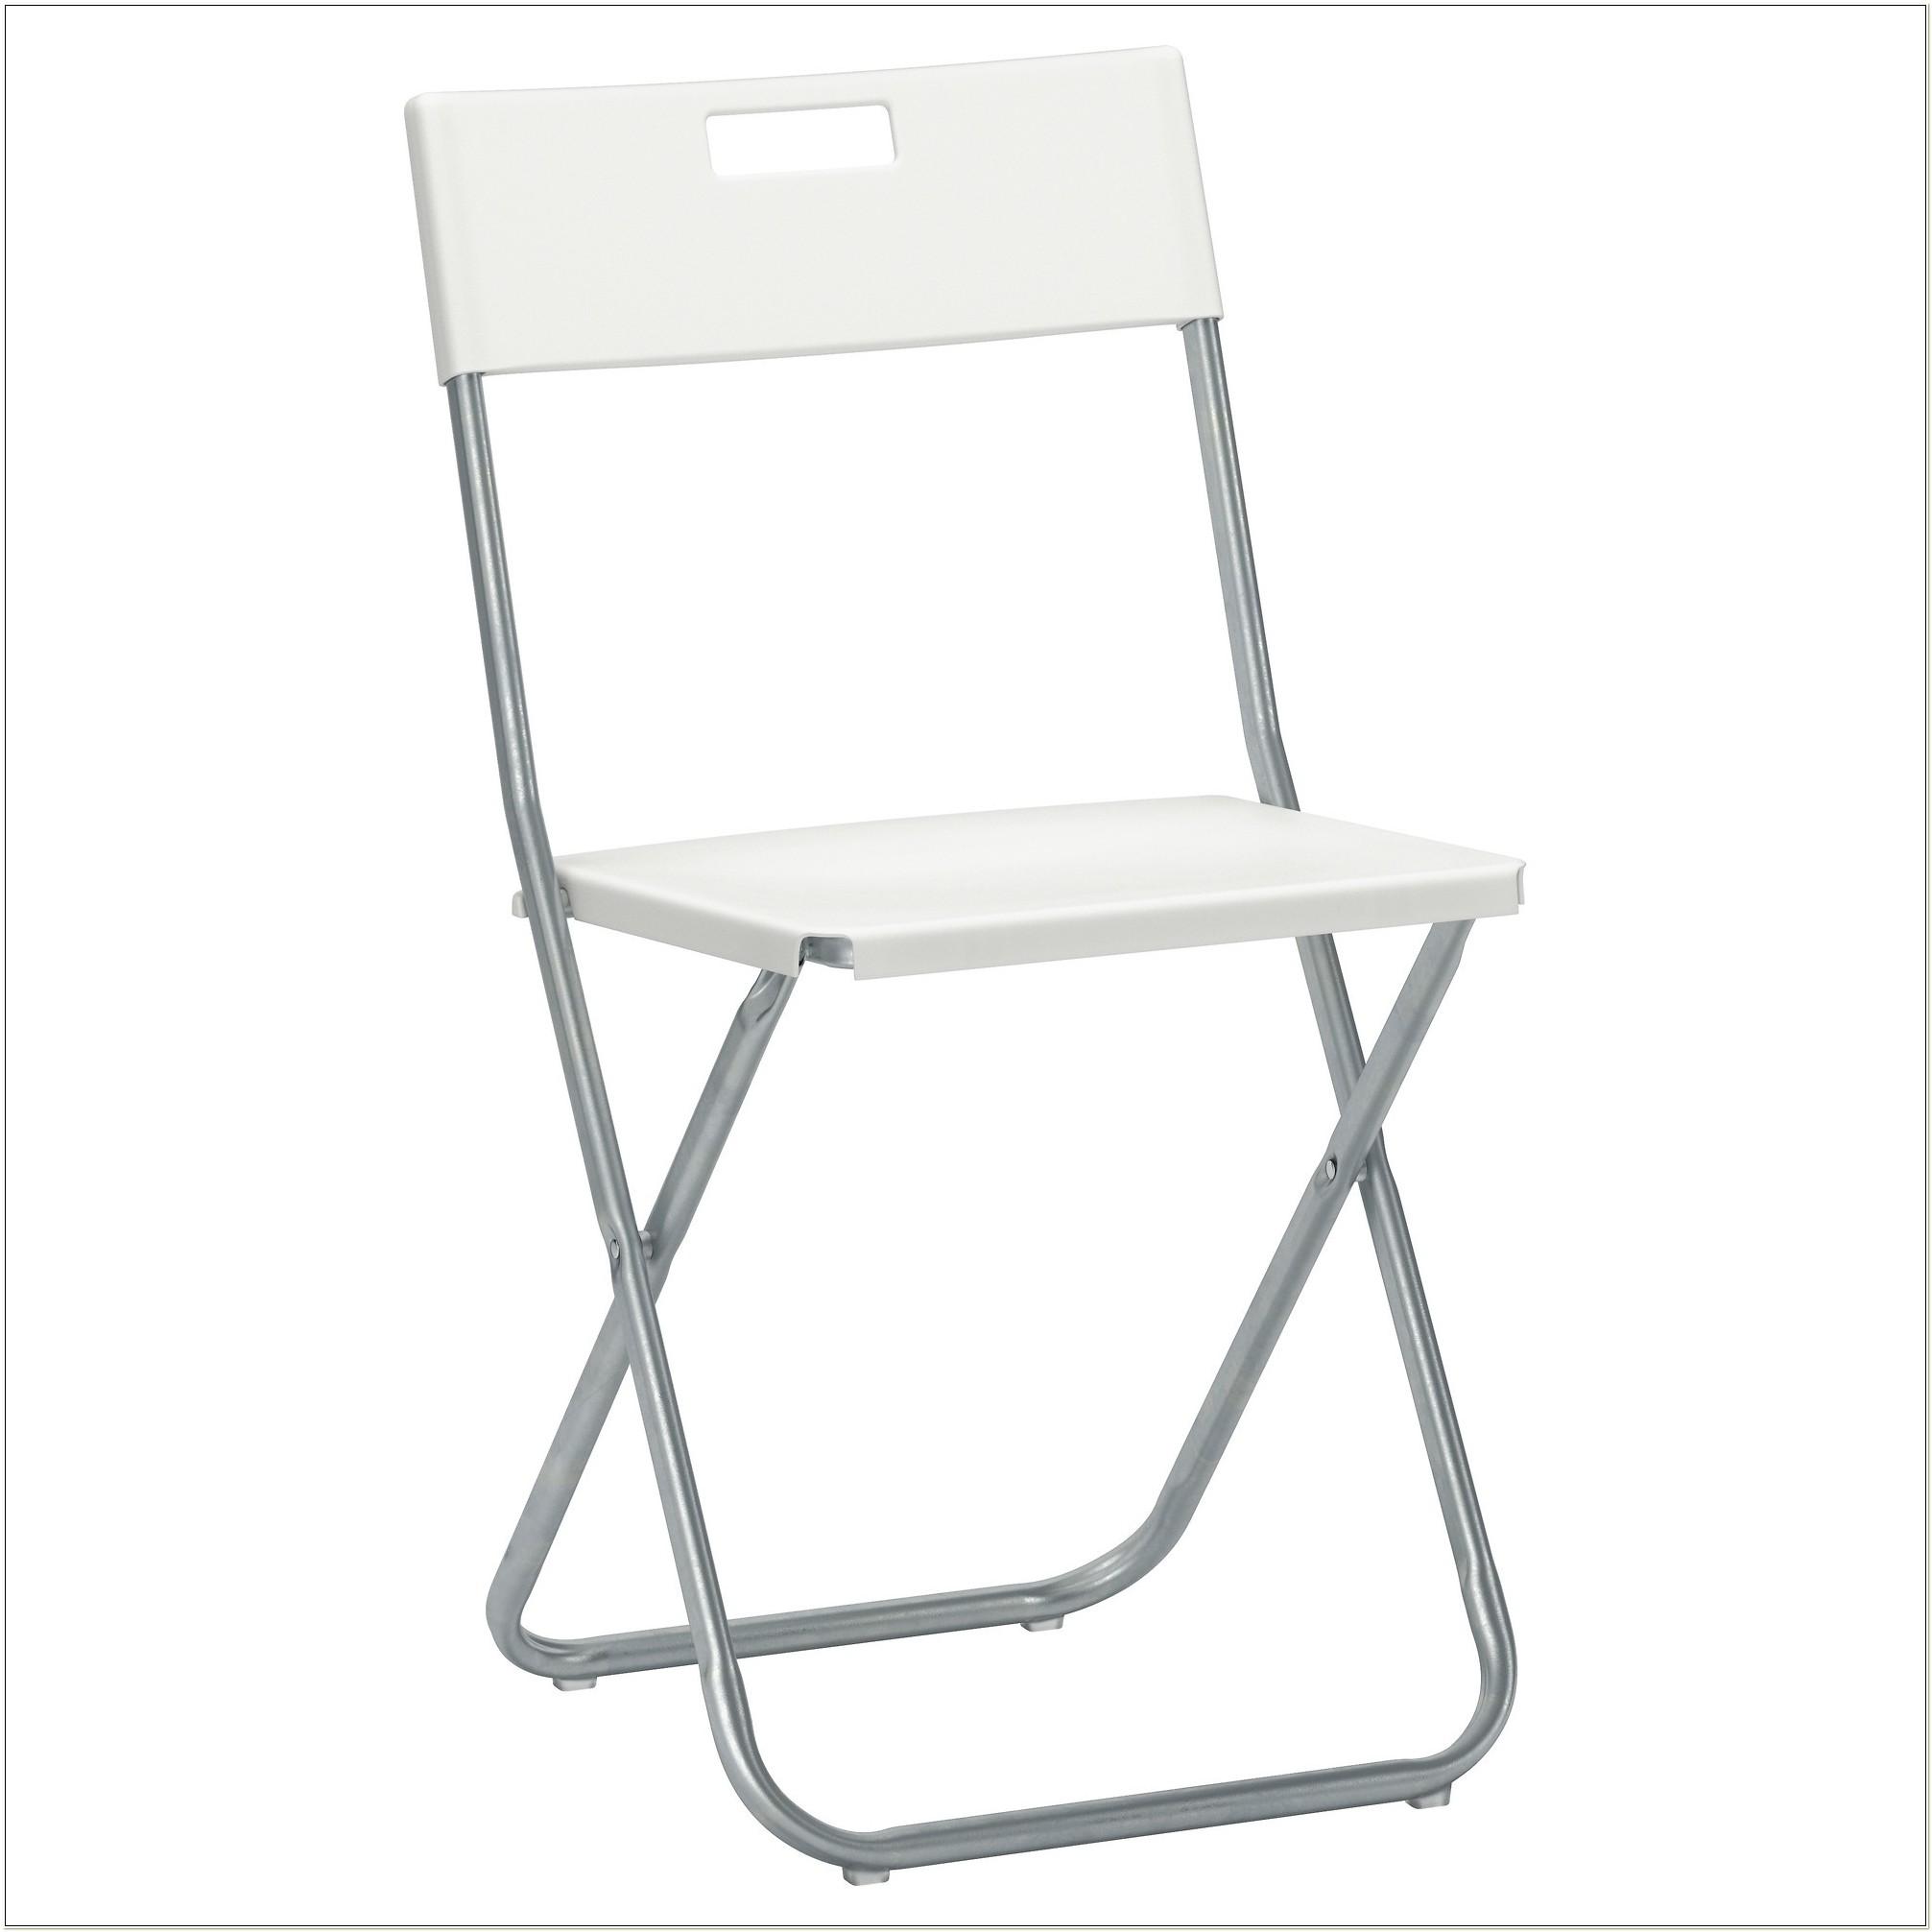 Ikea White Fold Up Chairs